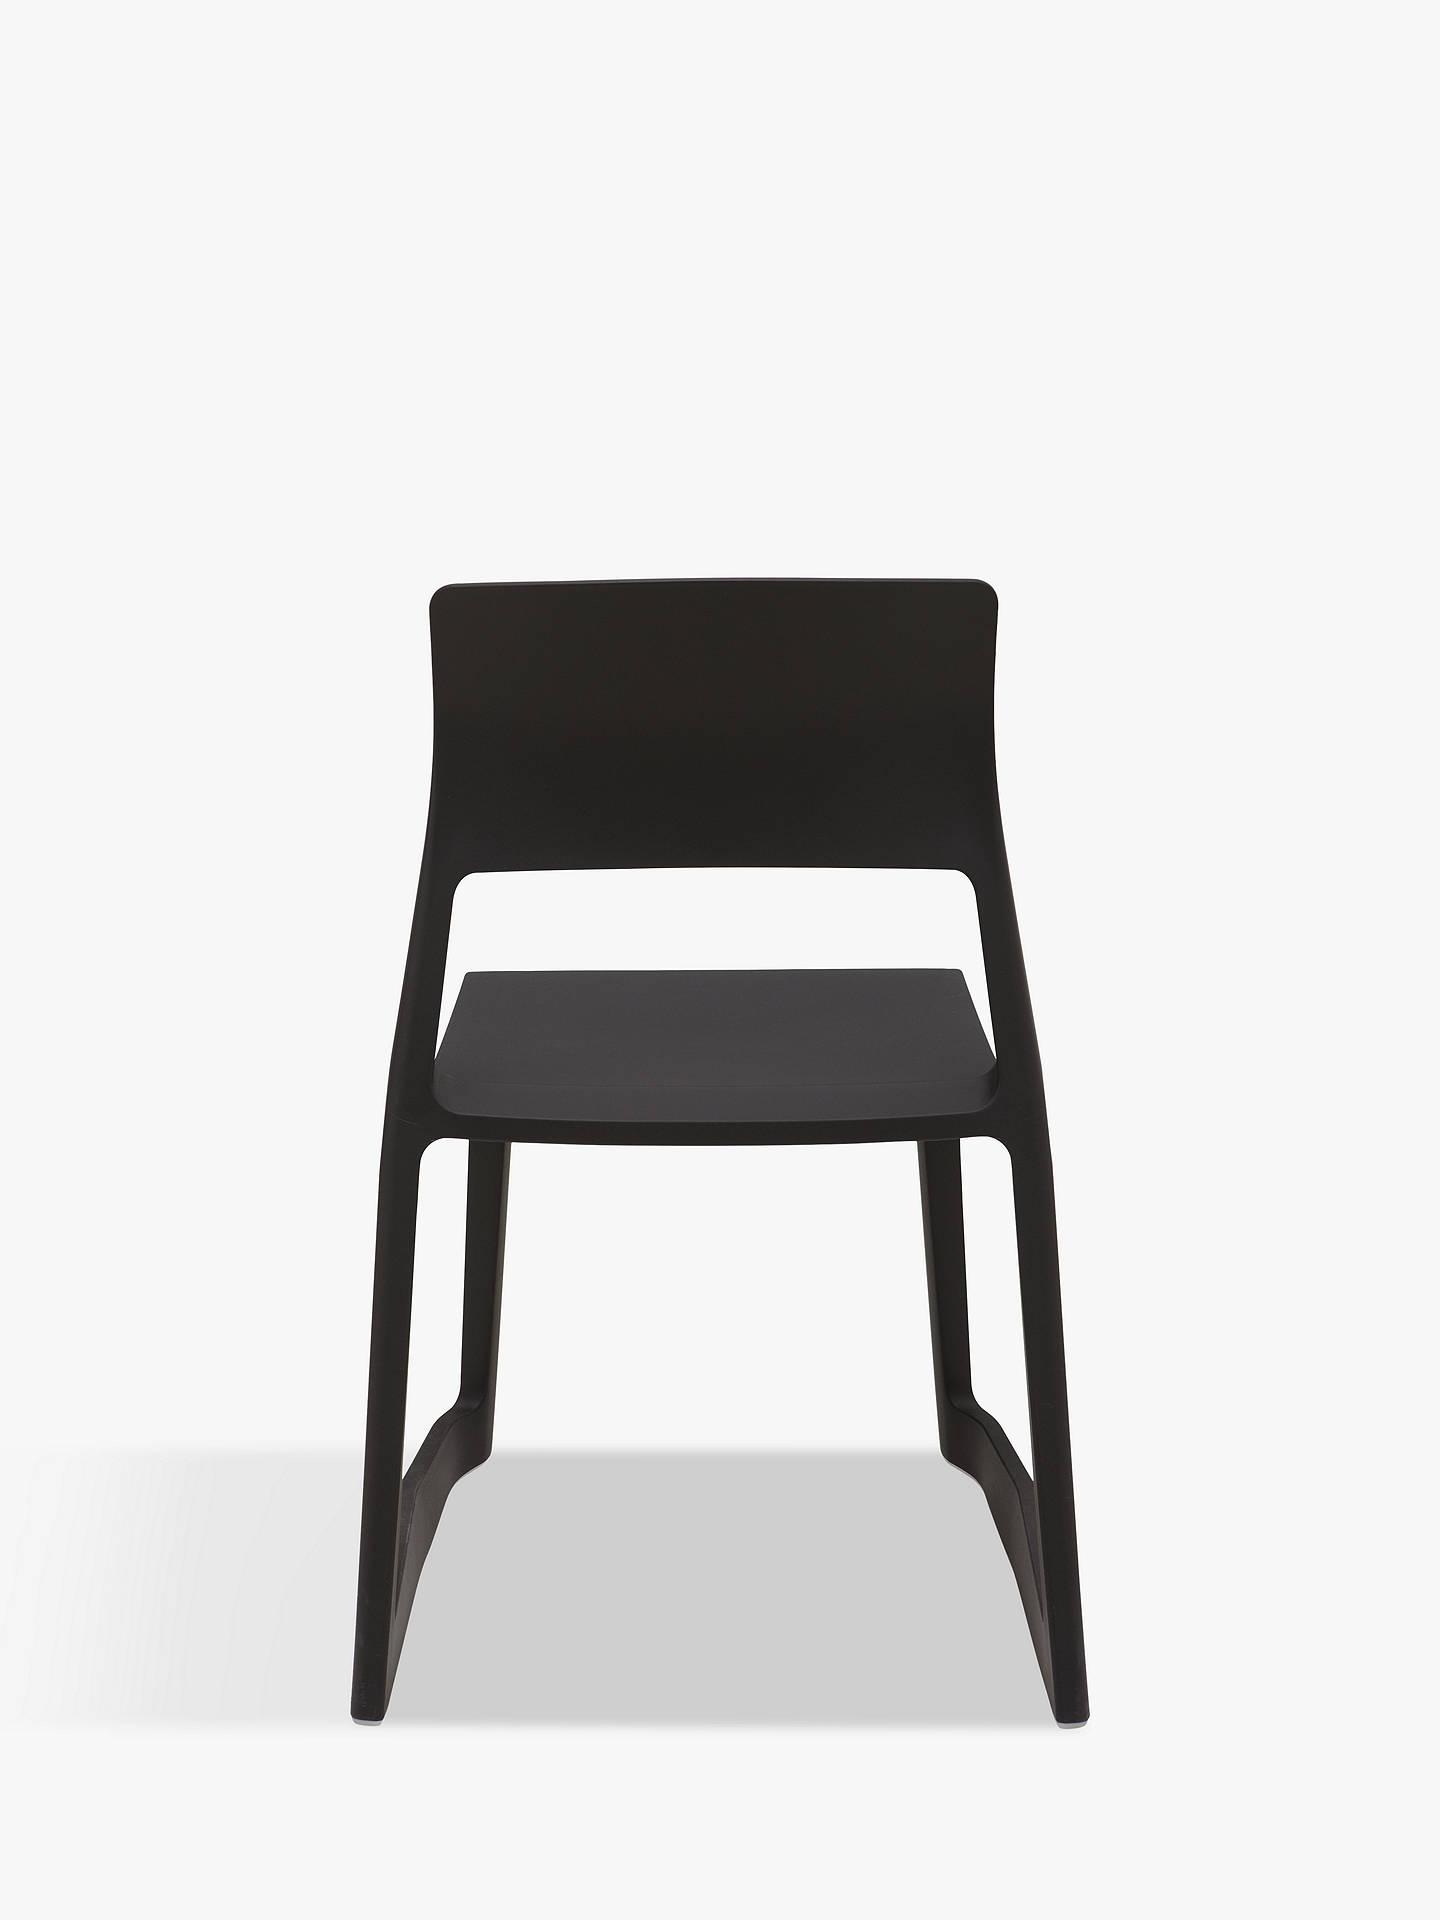 vitra tip ton chair black at john lewis partners. Black Bedroom Furniture Sets. Home Design Ideas